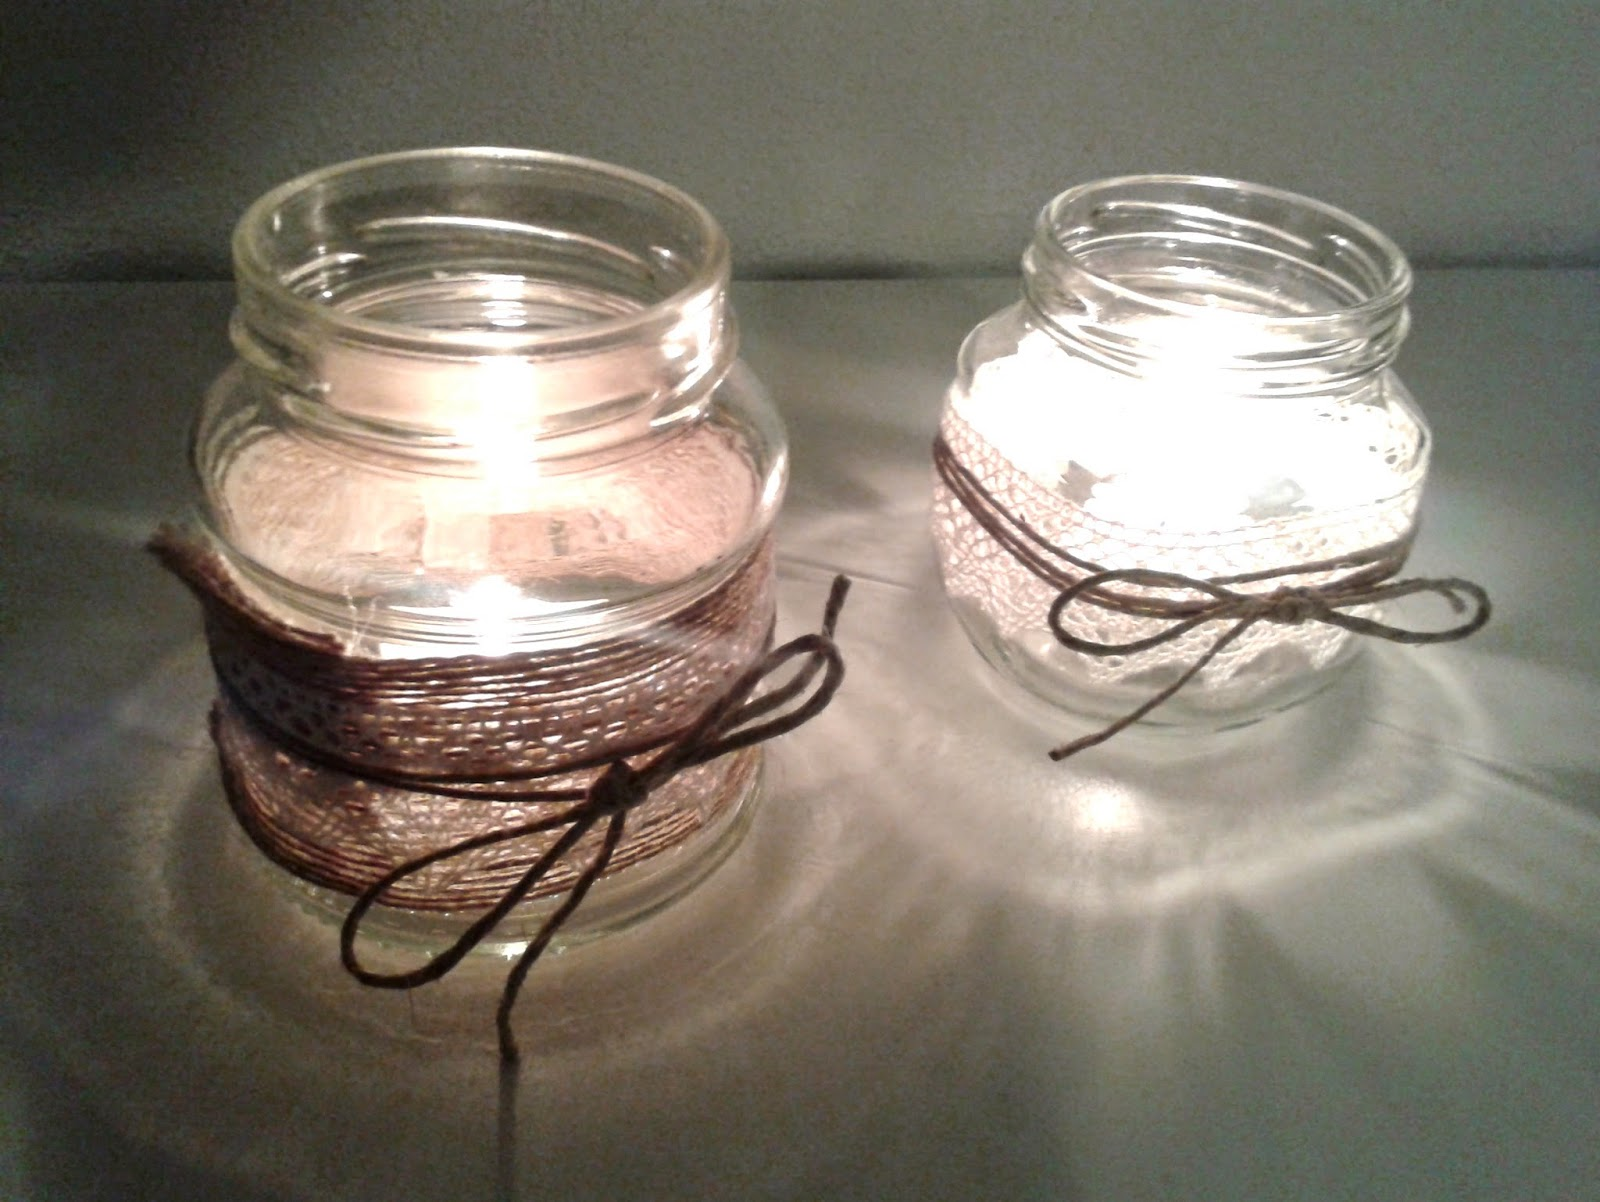 decorar con tarros de cristal - Botes De Cristal Decorados